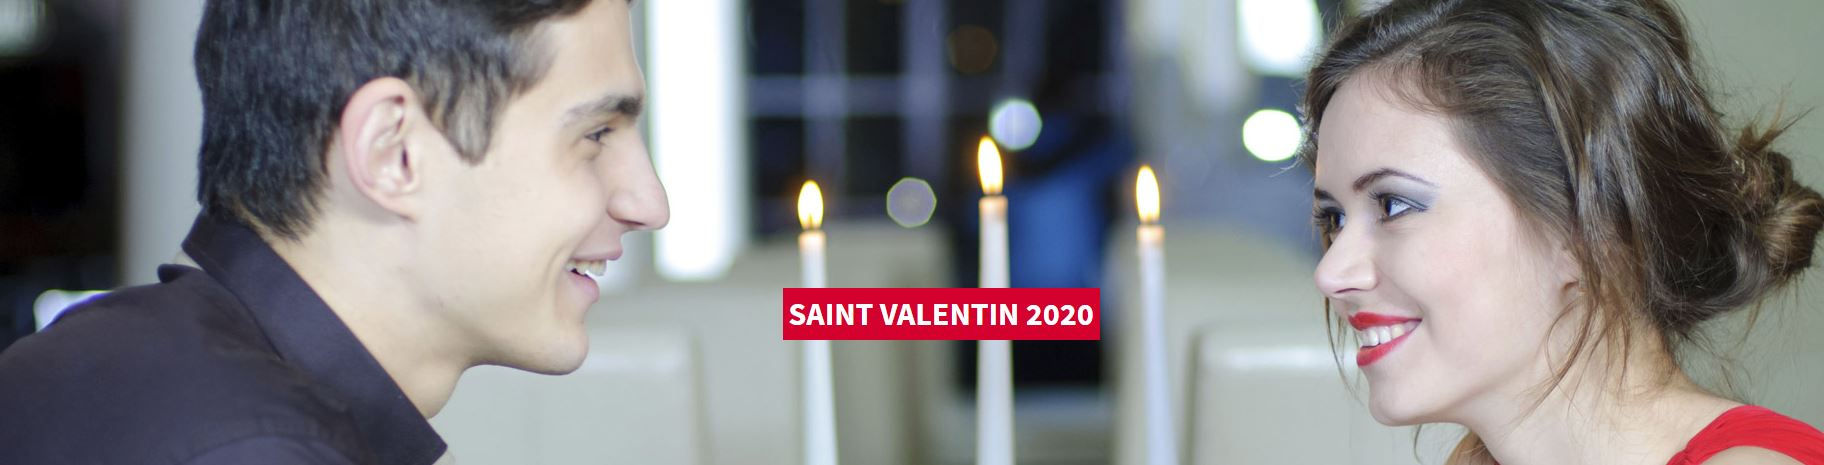 Valentin 2020